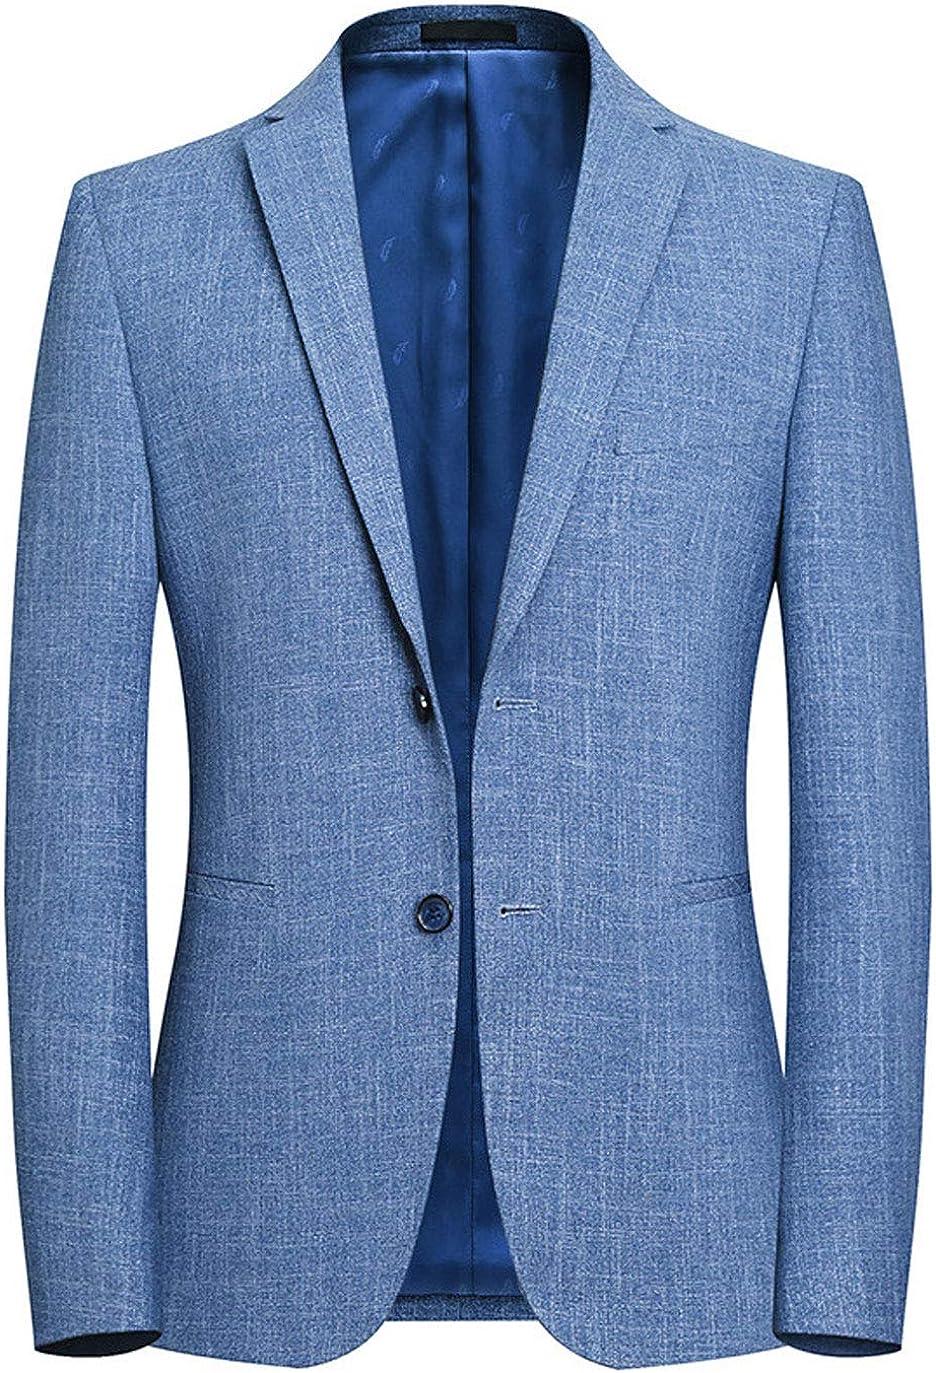 ebossy Men's Spring 2 Button Slim Fit Casual Lightweight Blazer Jacket Sport Coat